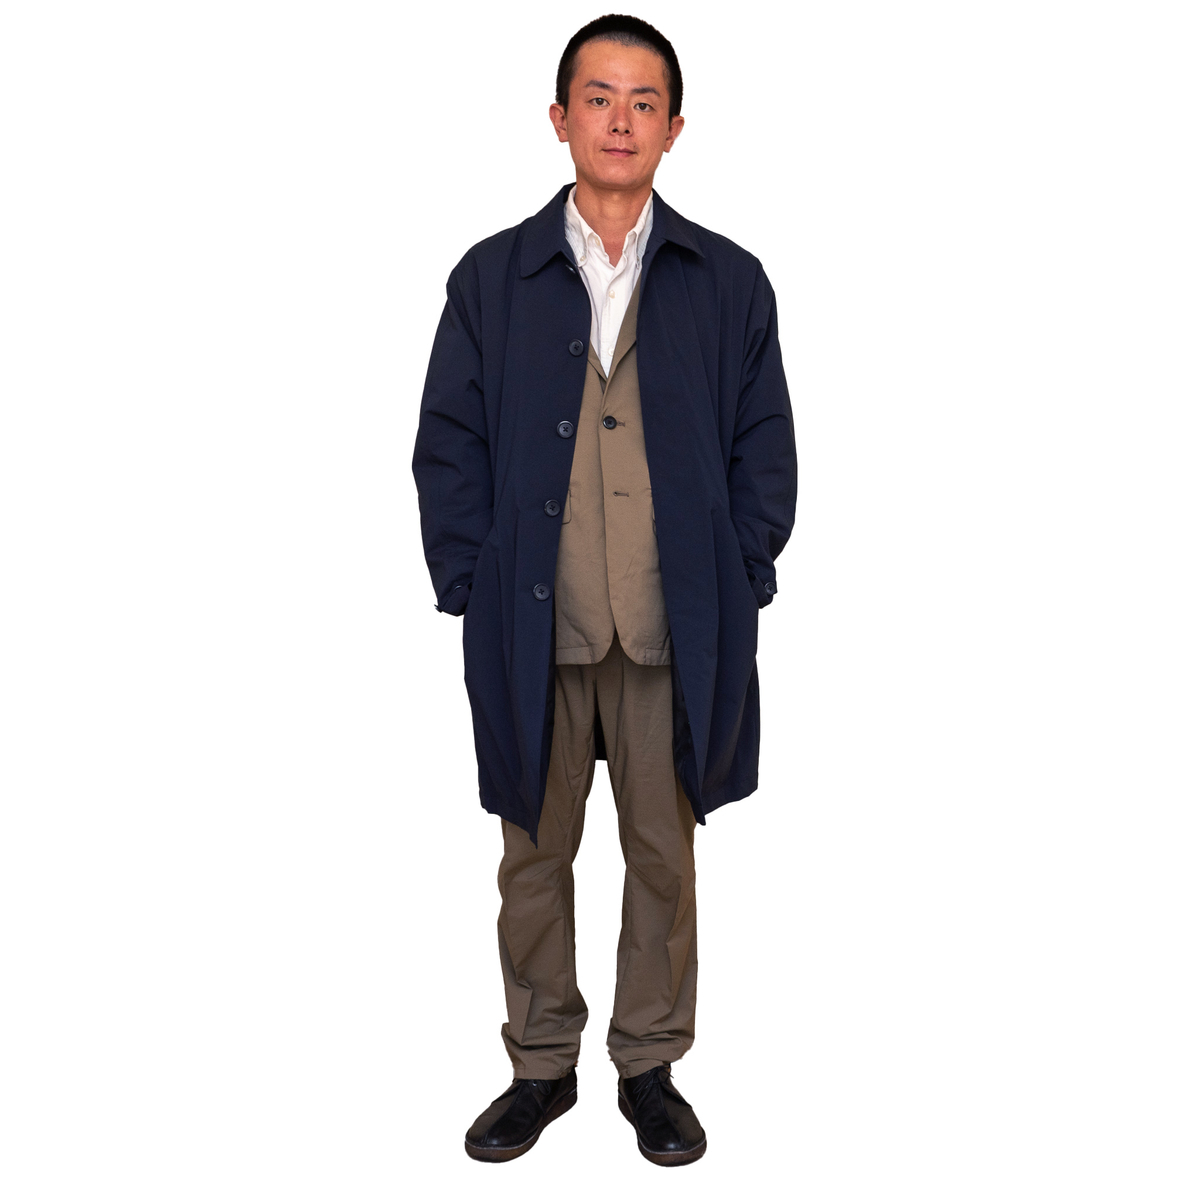 f:id:yamada0221:20210729124437j:plain